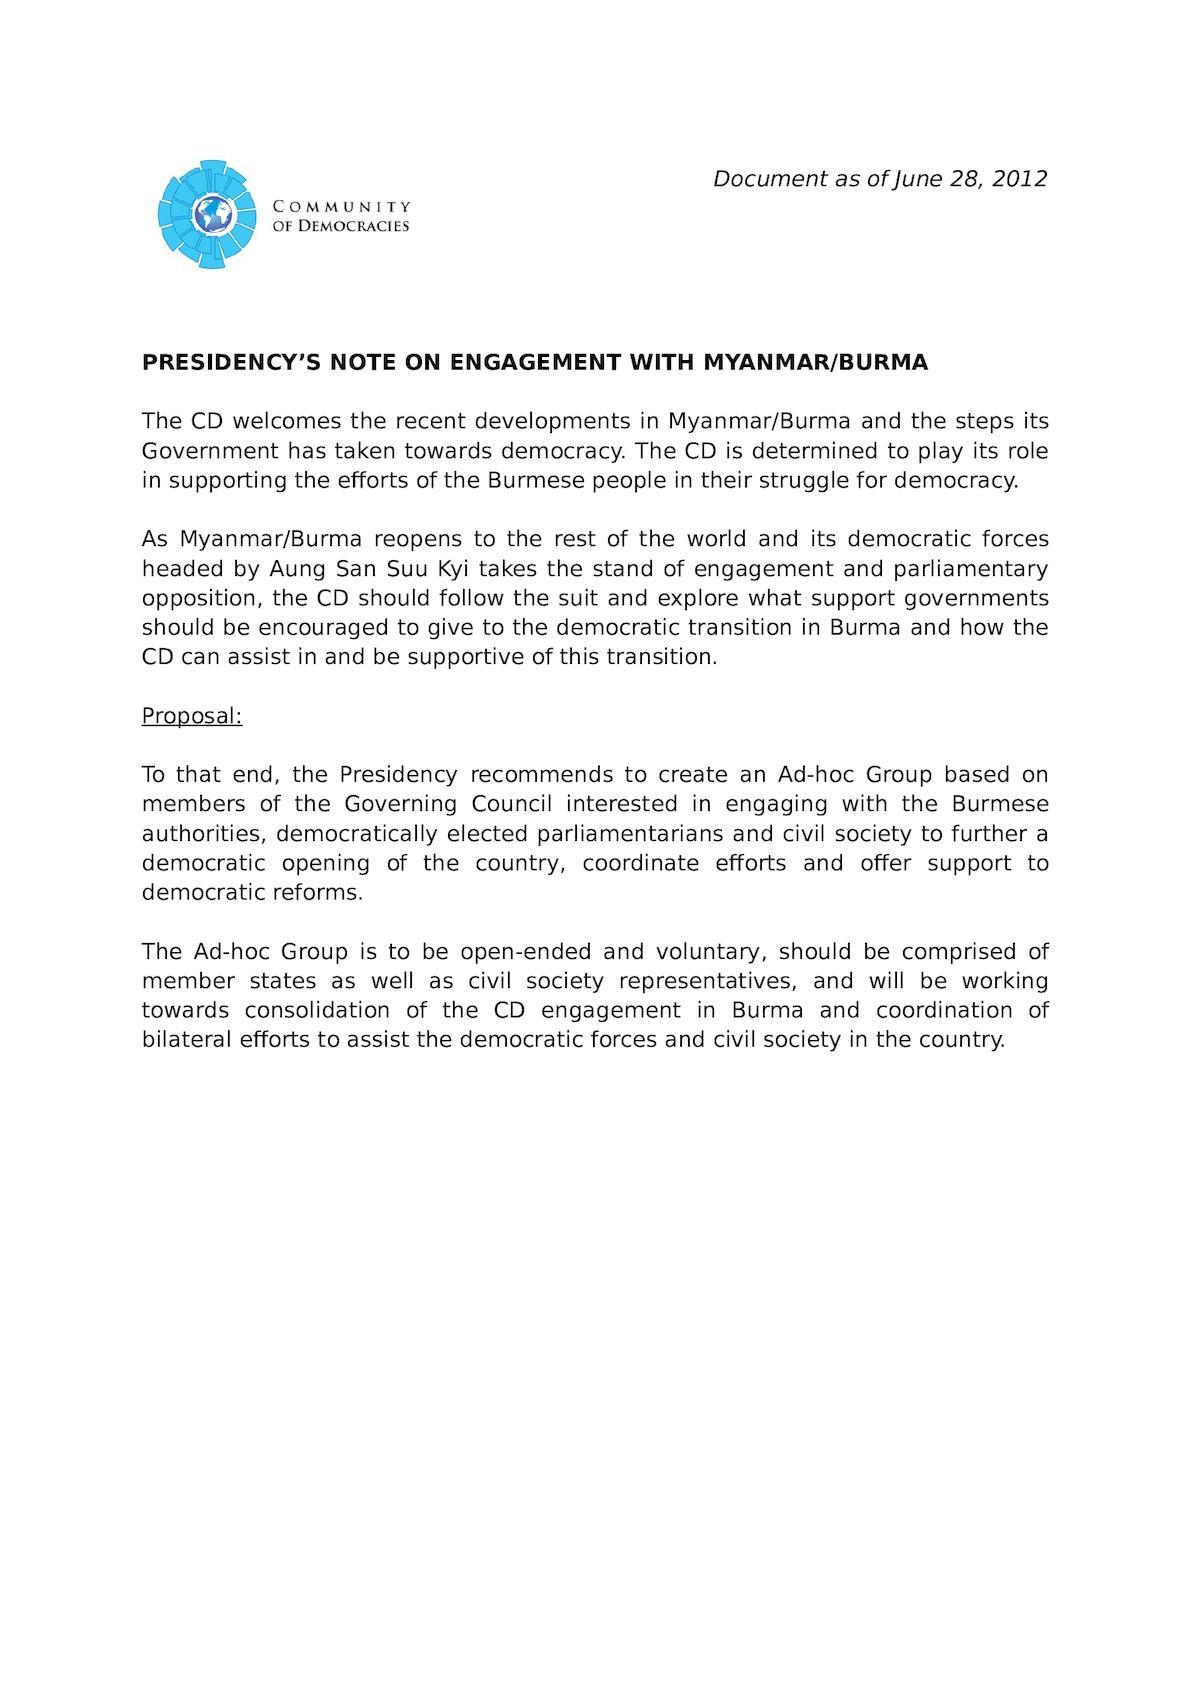 4th GC Meeting_(9) CD Assistance To Myanmar Burma